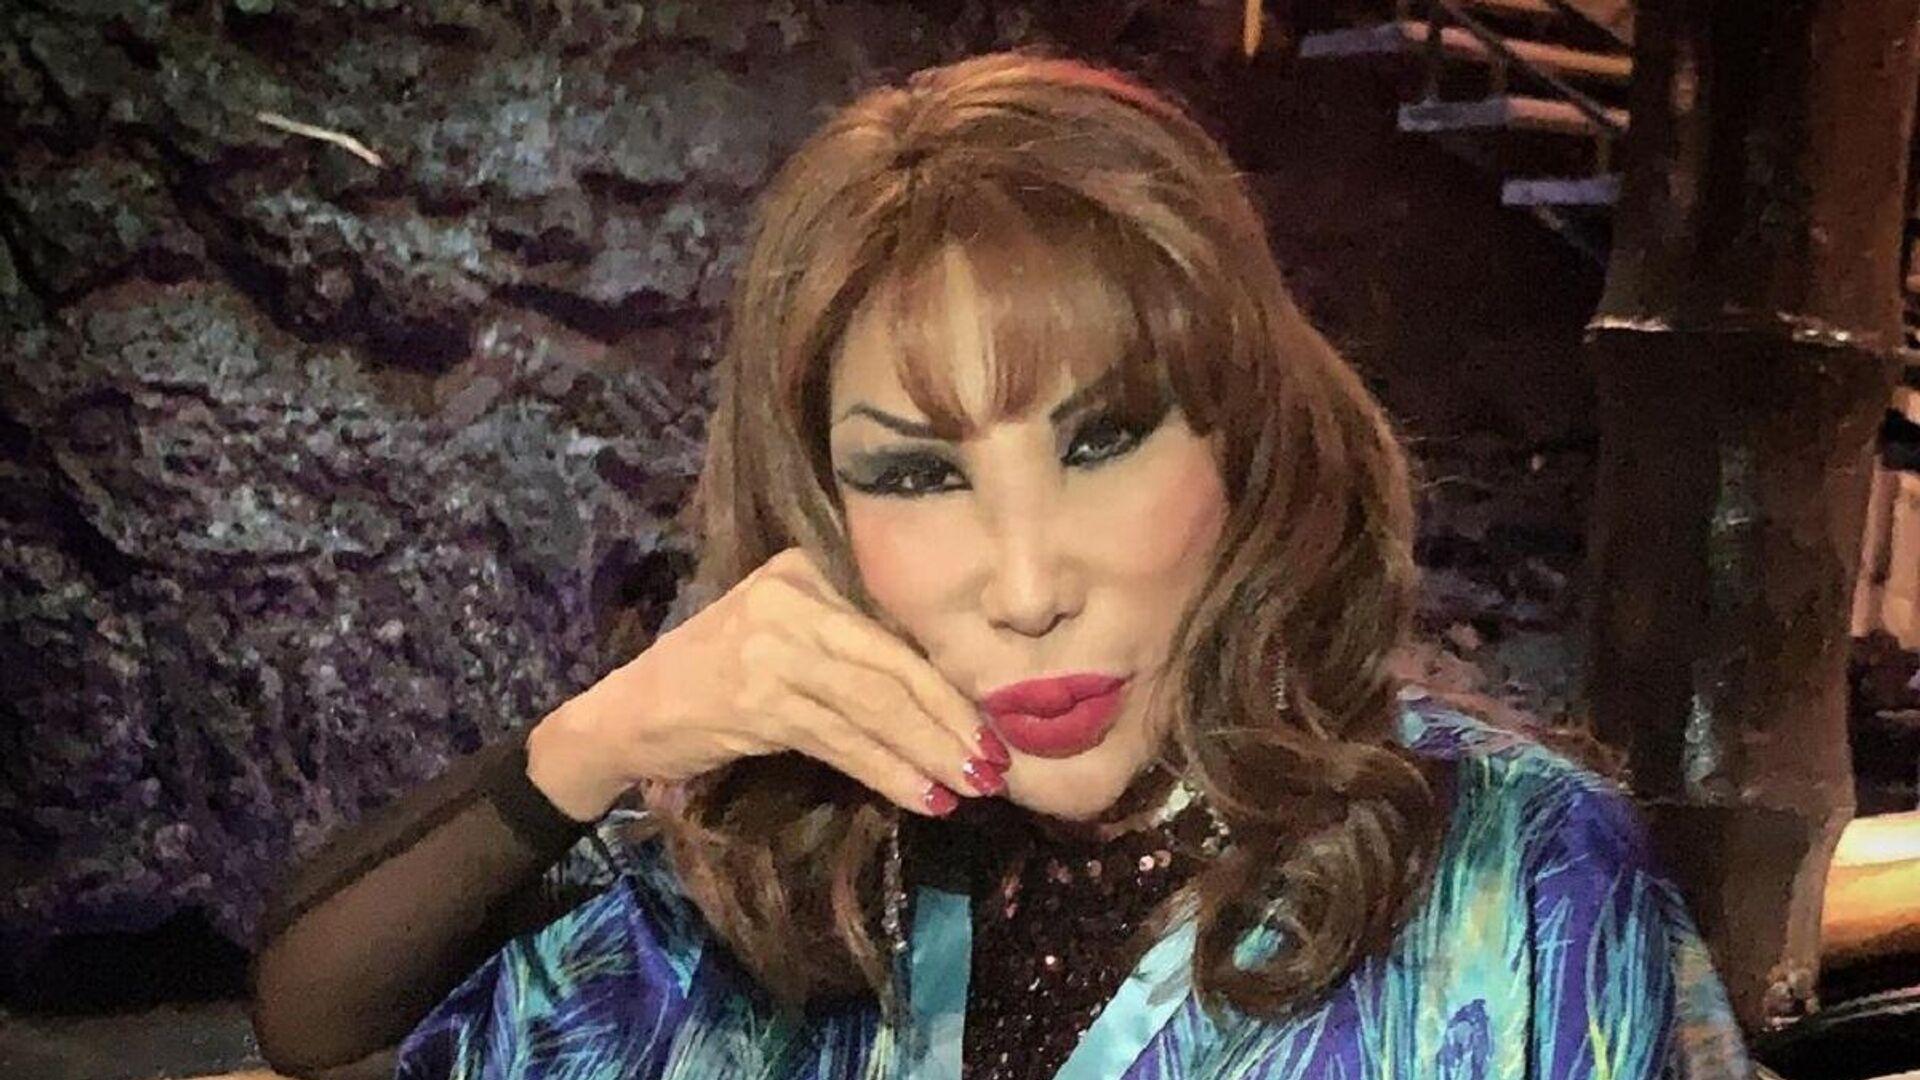 Lyn May, bailarina y actriz mexicana - Sputnik Mundo, 1920, 09.08.2021